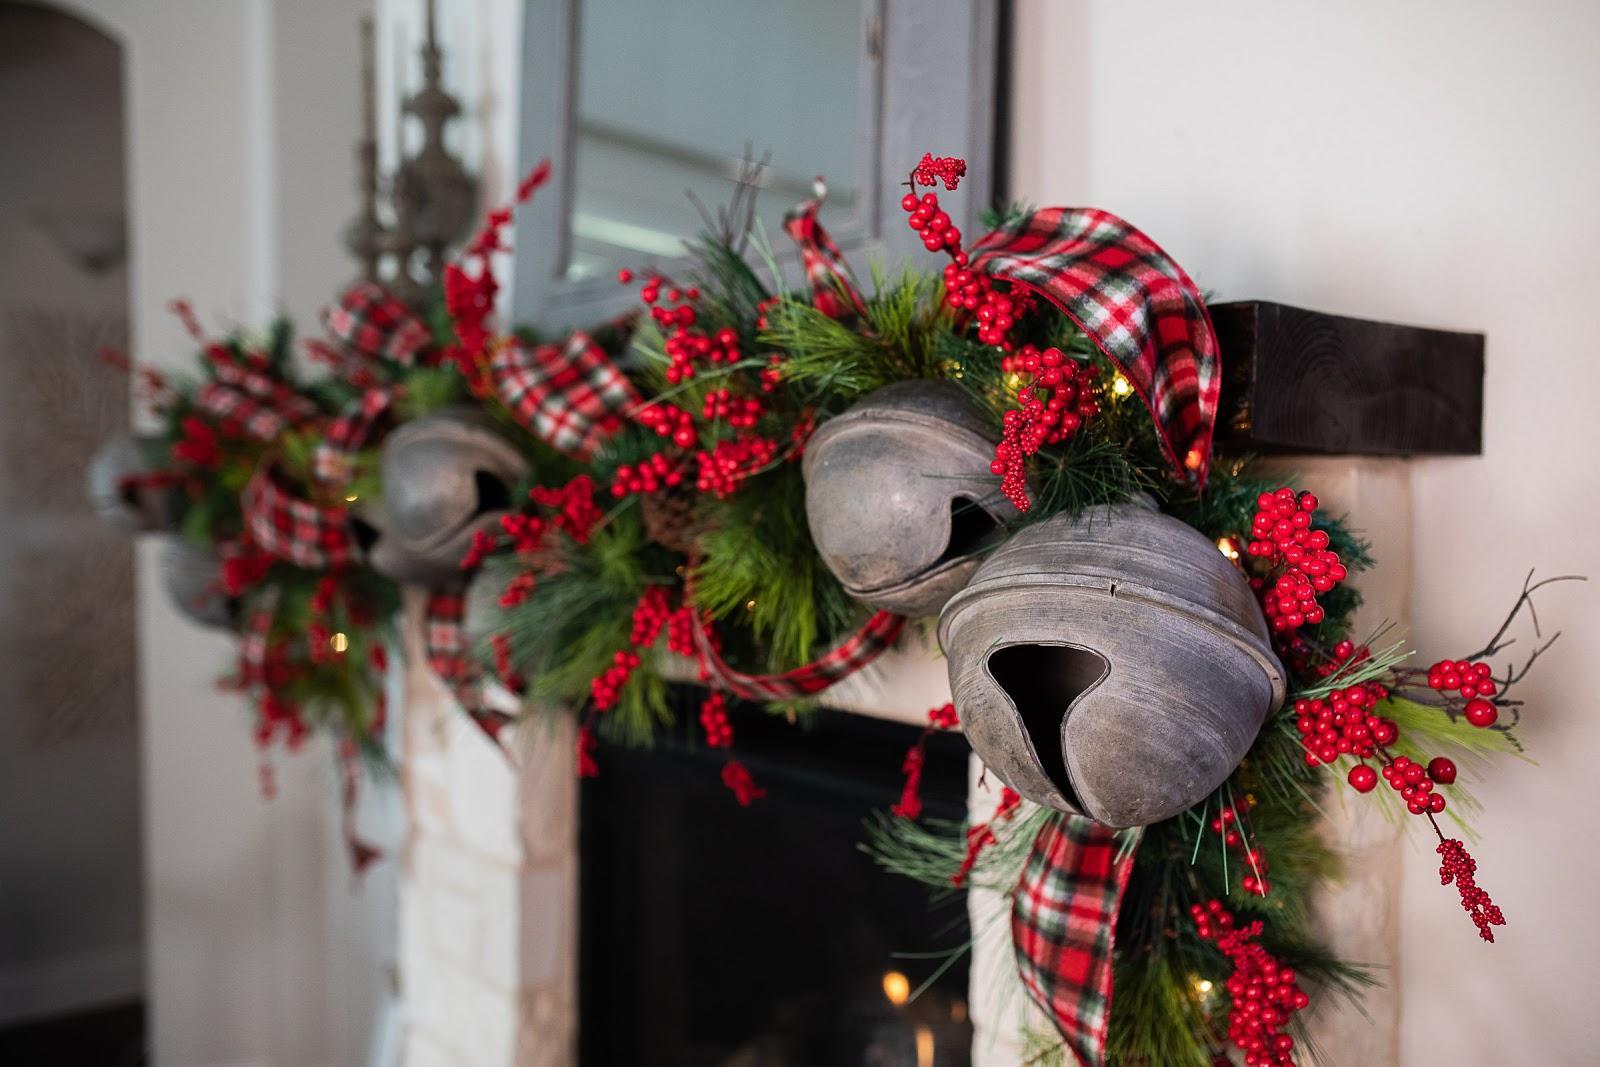 Christmas Decorating Trends 2020: μεταλλικά στολίδια στο σπίτι